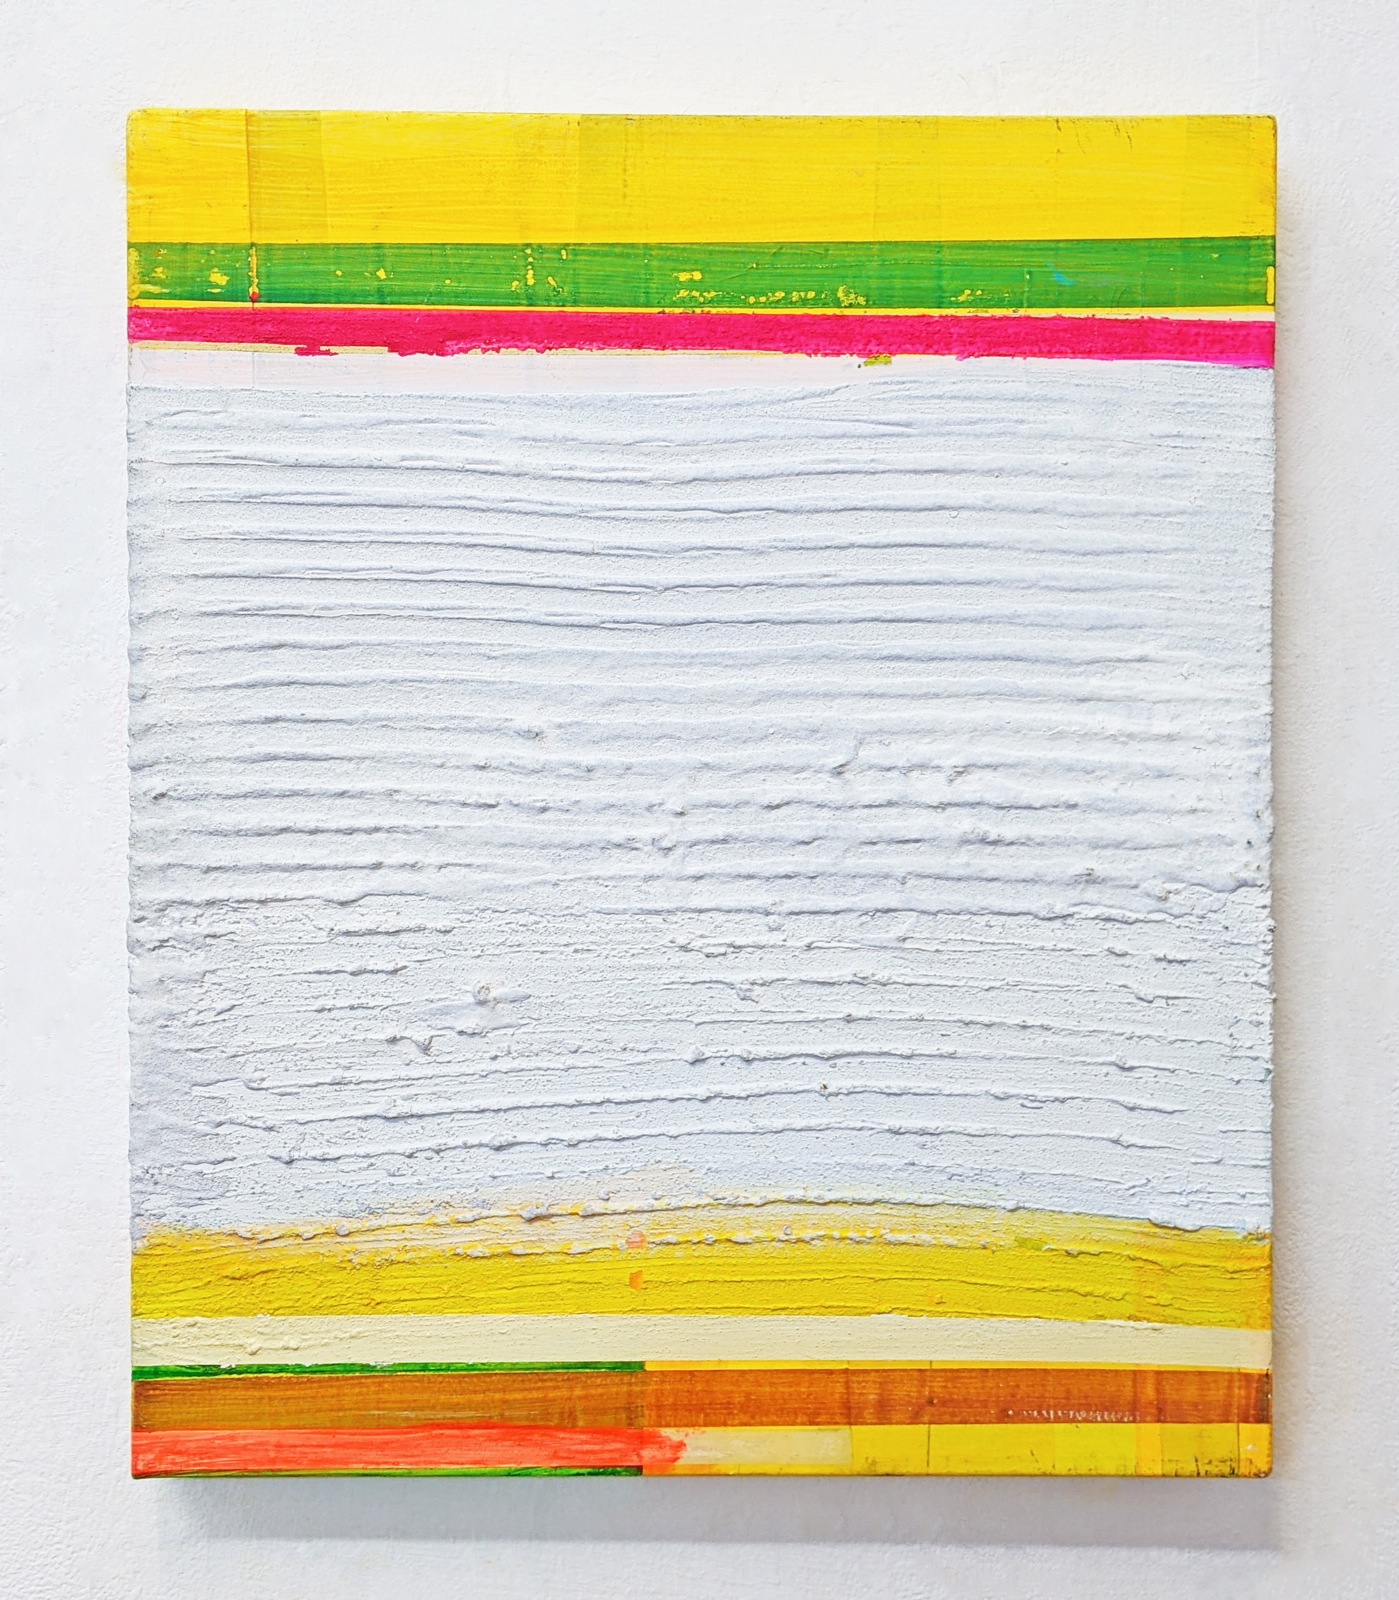 """Weissdecke"", 54x45 cm, Acrylfarbe, Leinwand, 2000"